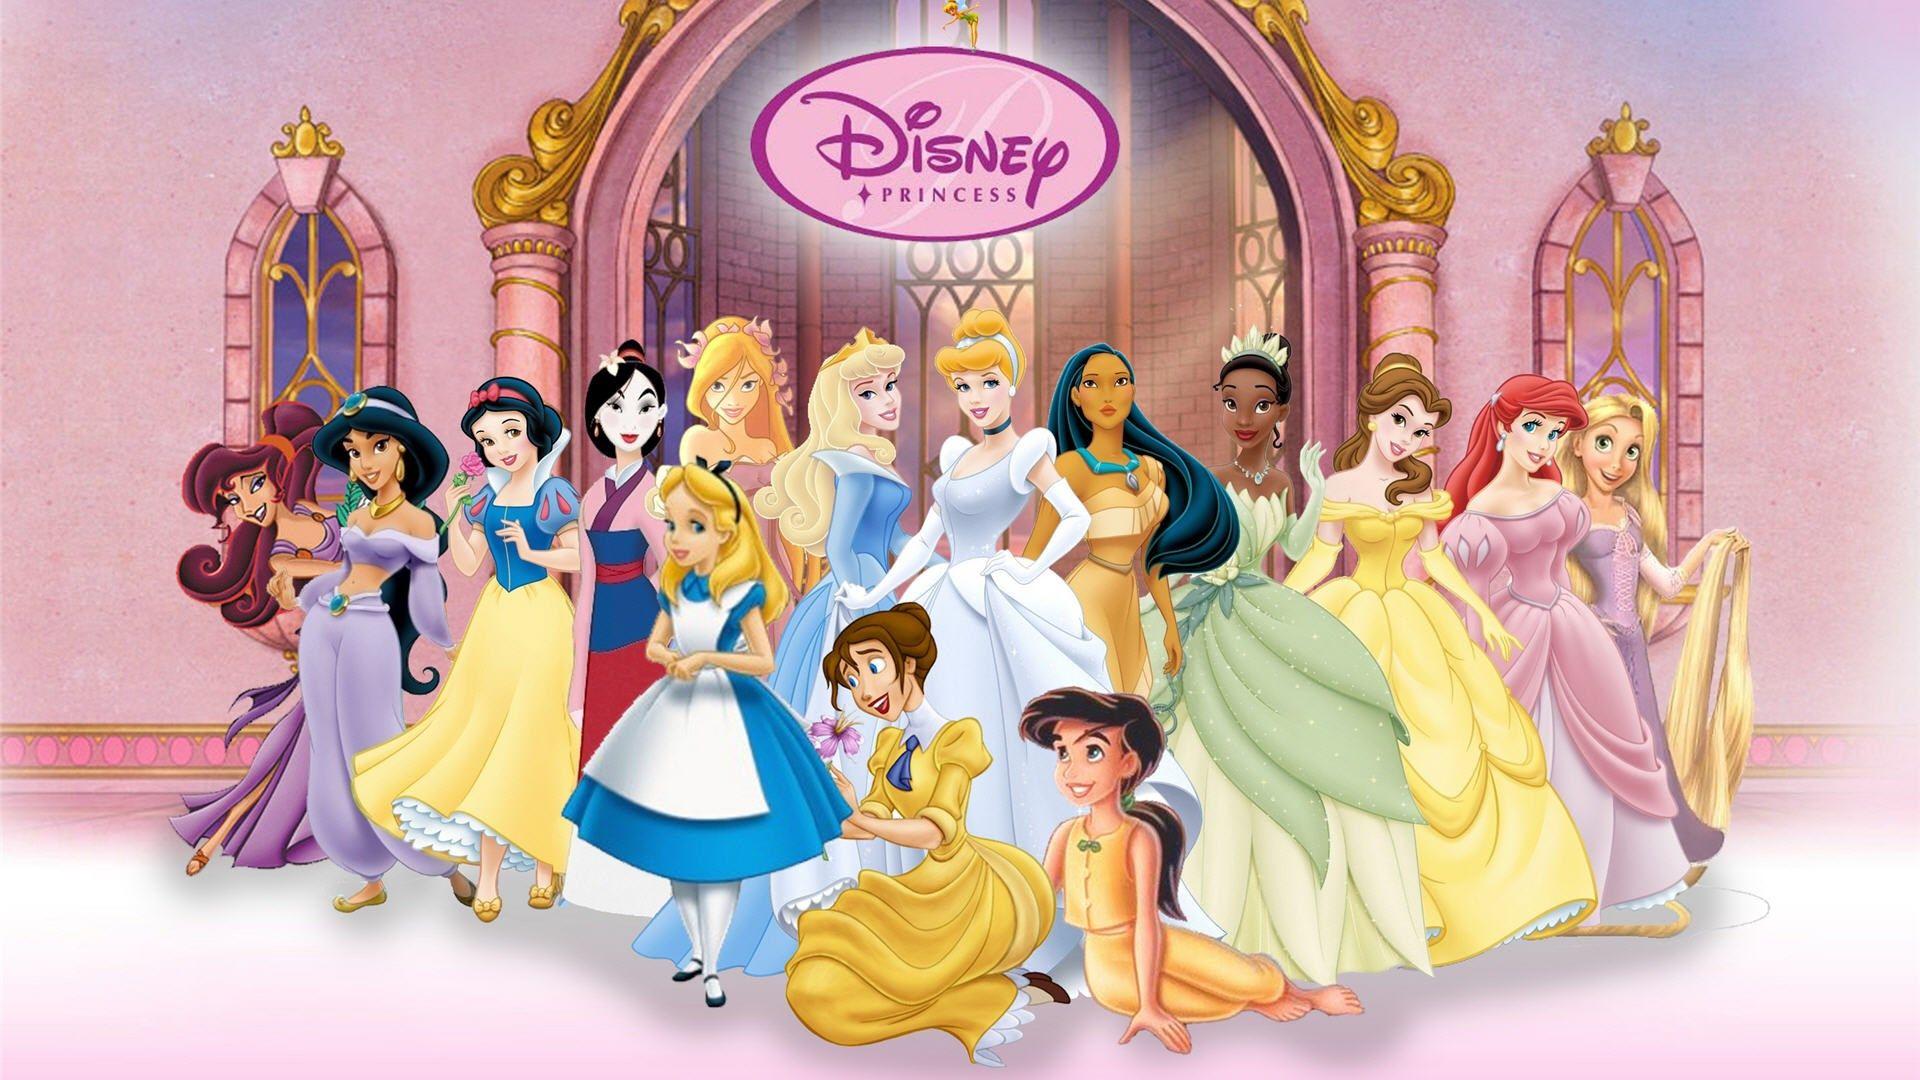 Top Wallpaper High Quality Disney - 4c5e5636361def2d89f8ee0211fb7ed1  Pic_79270.jpg